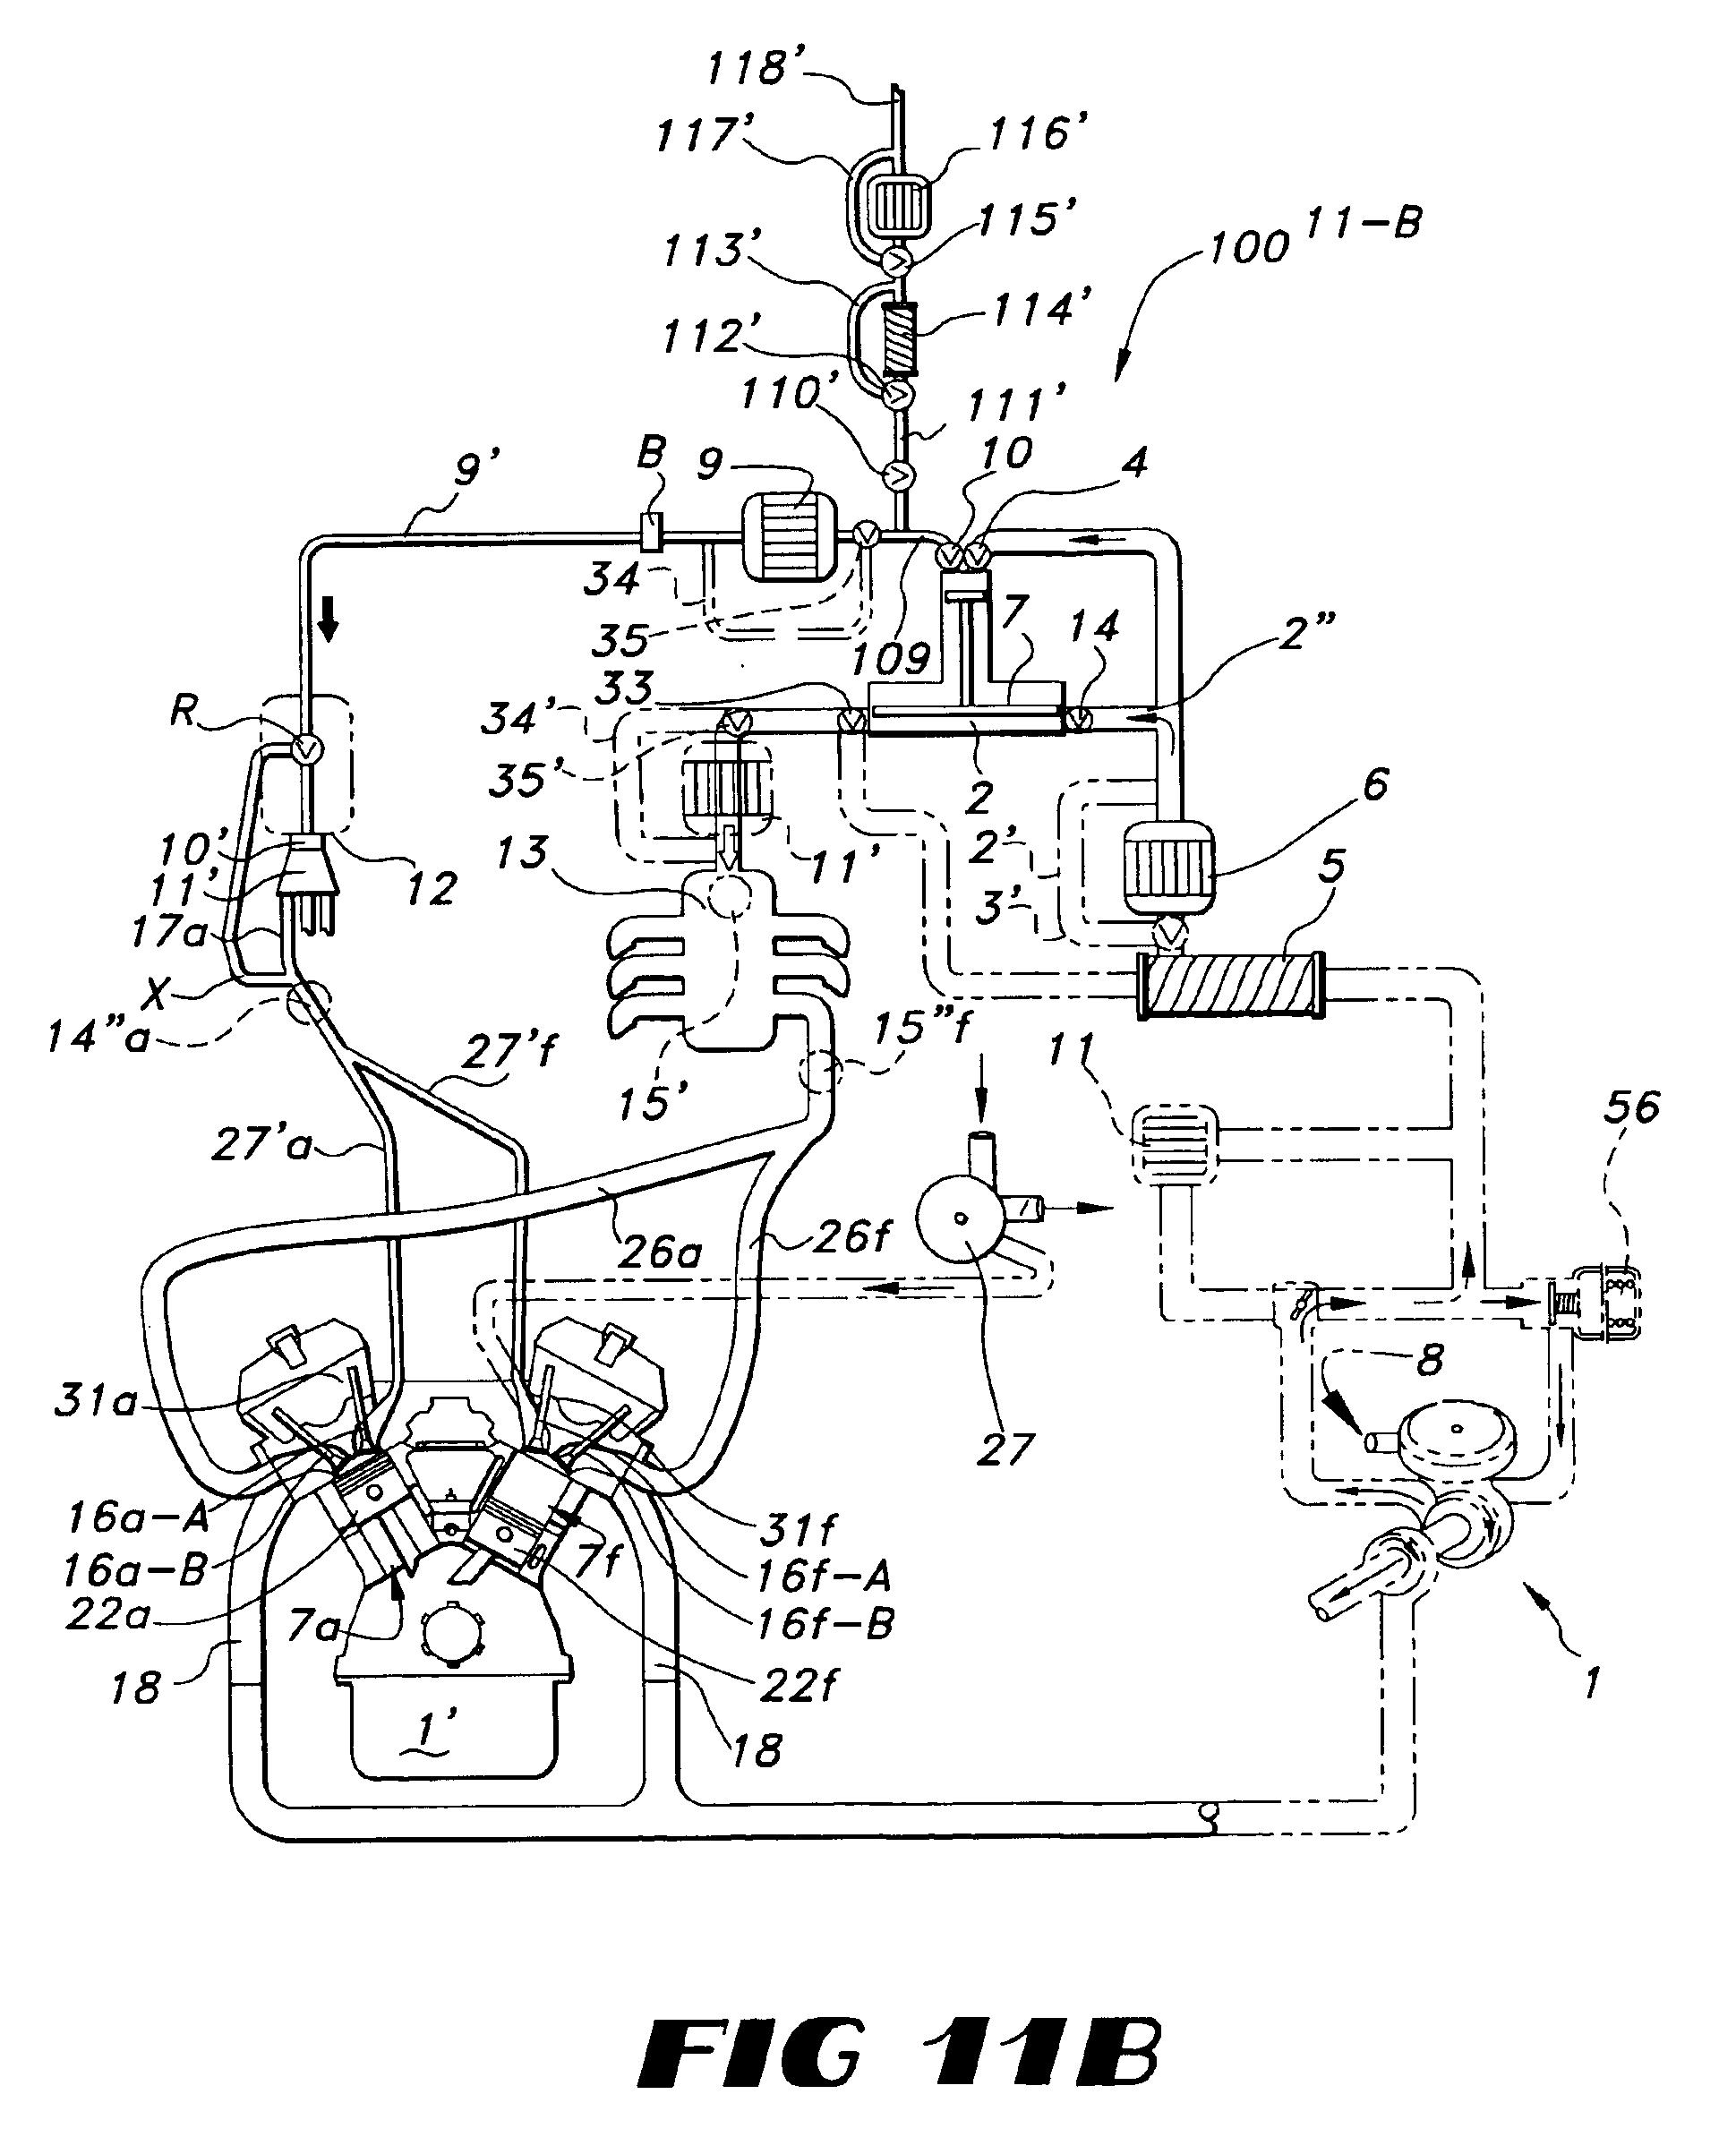 filter queen 112b wiring diagram